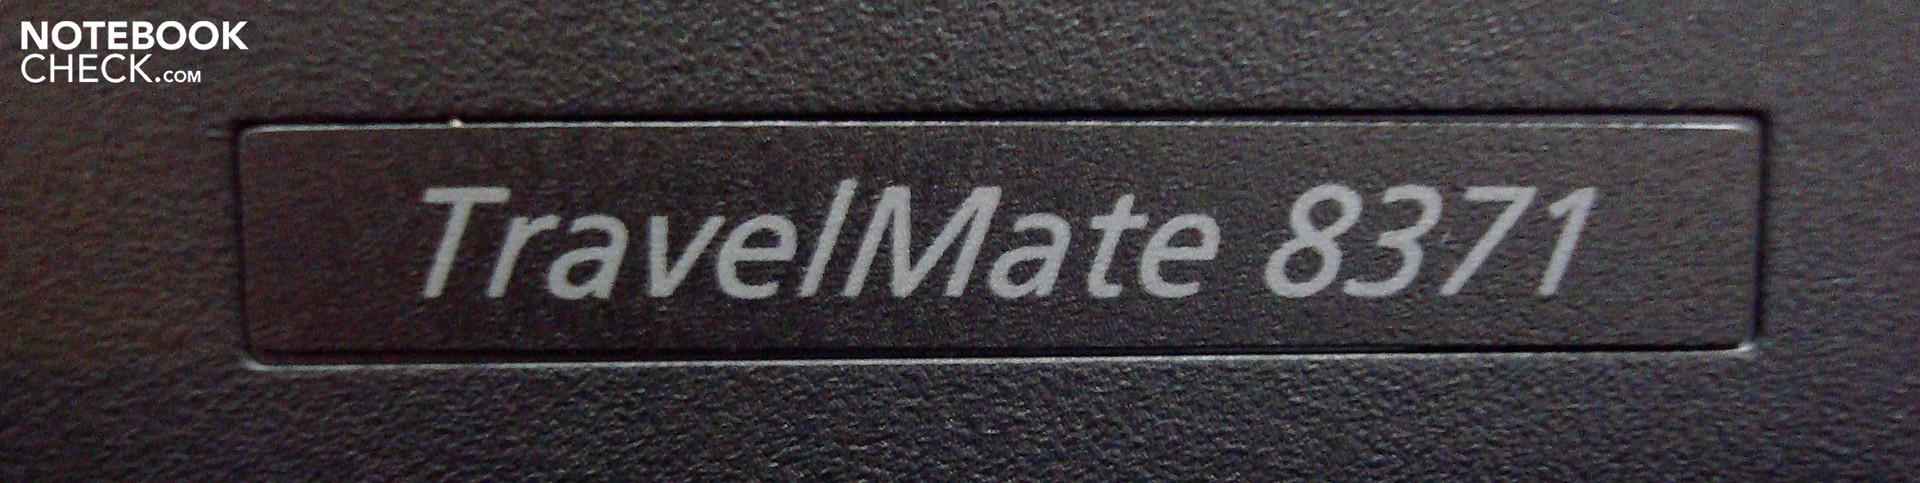 Acer Travelmate 8371